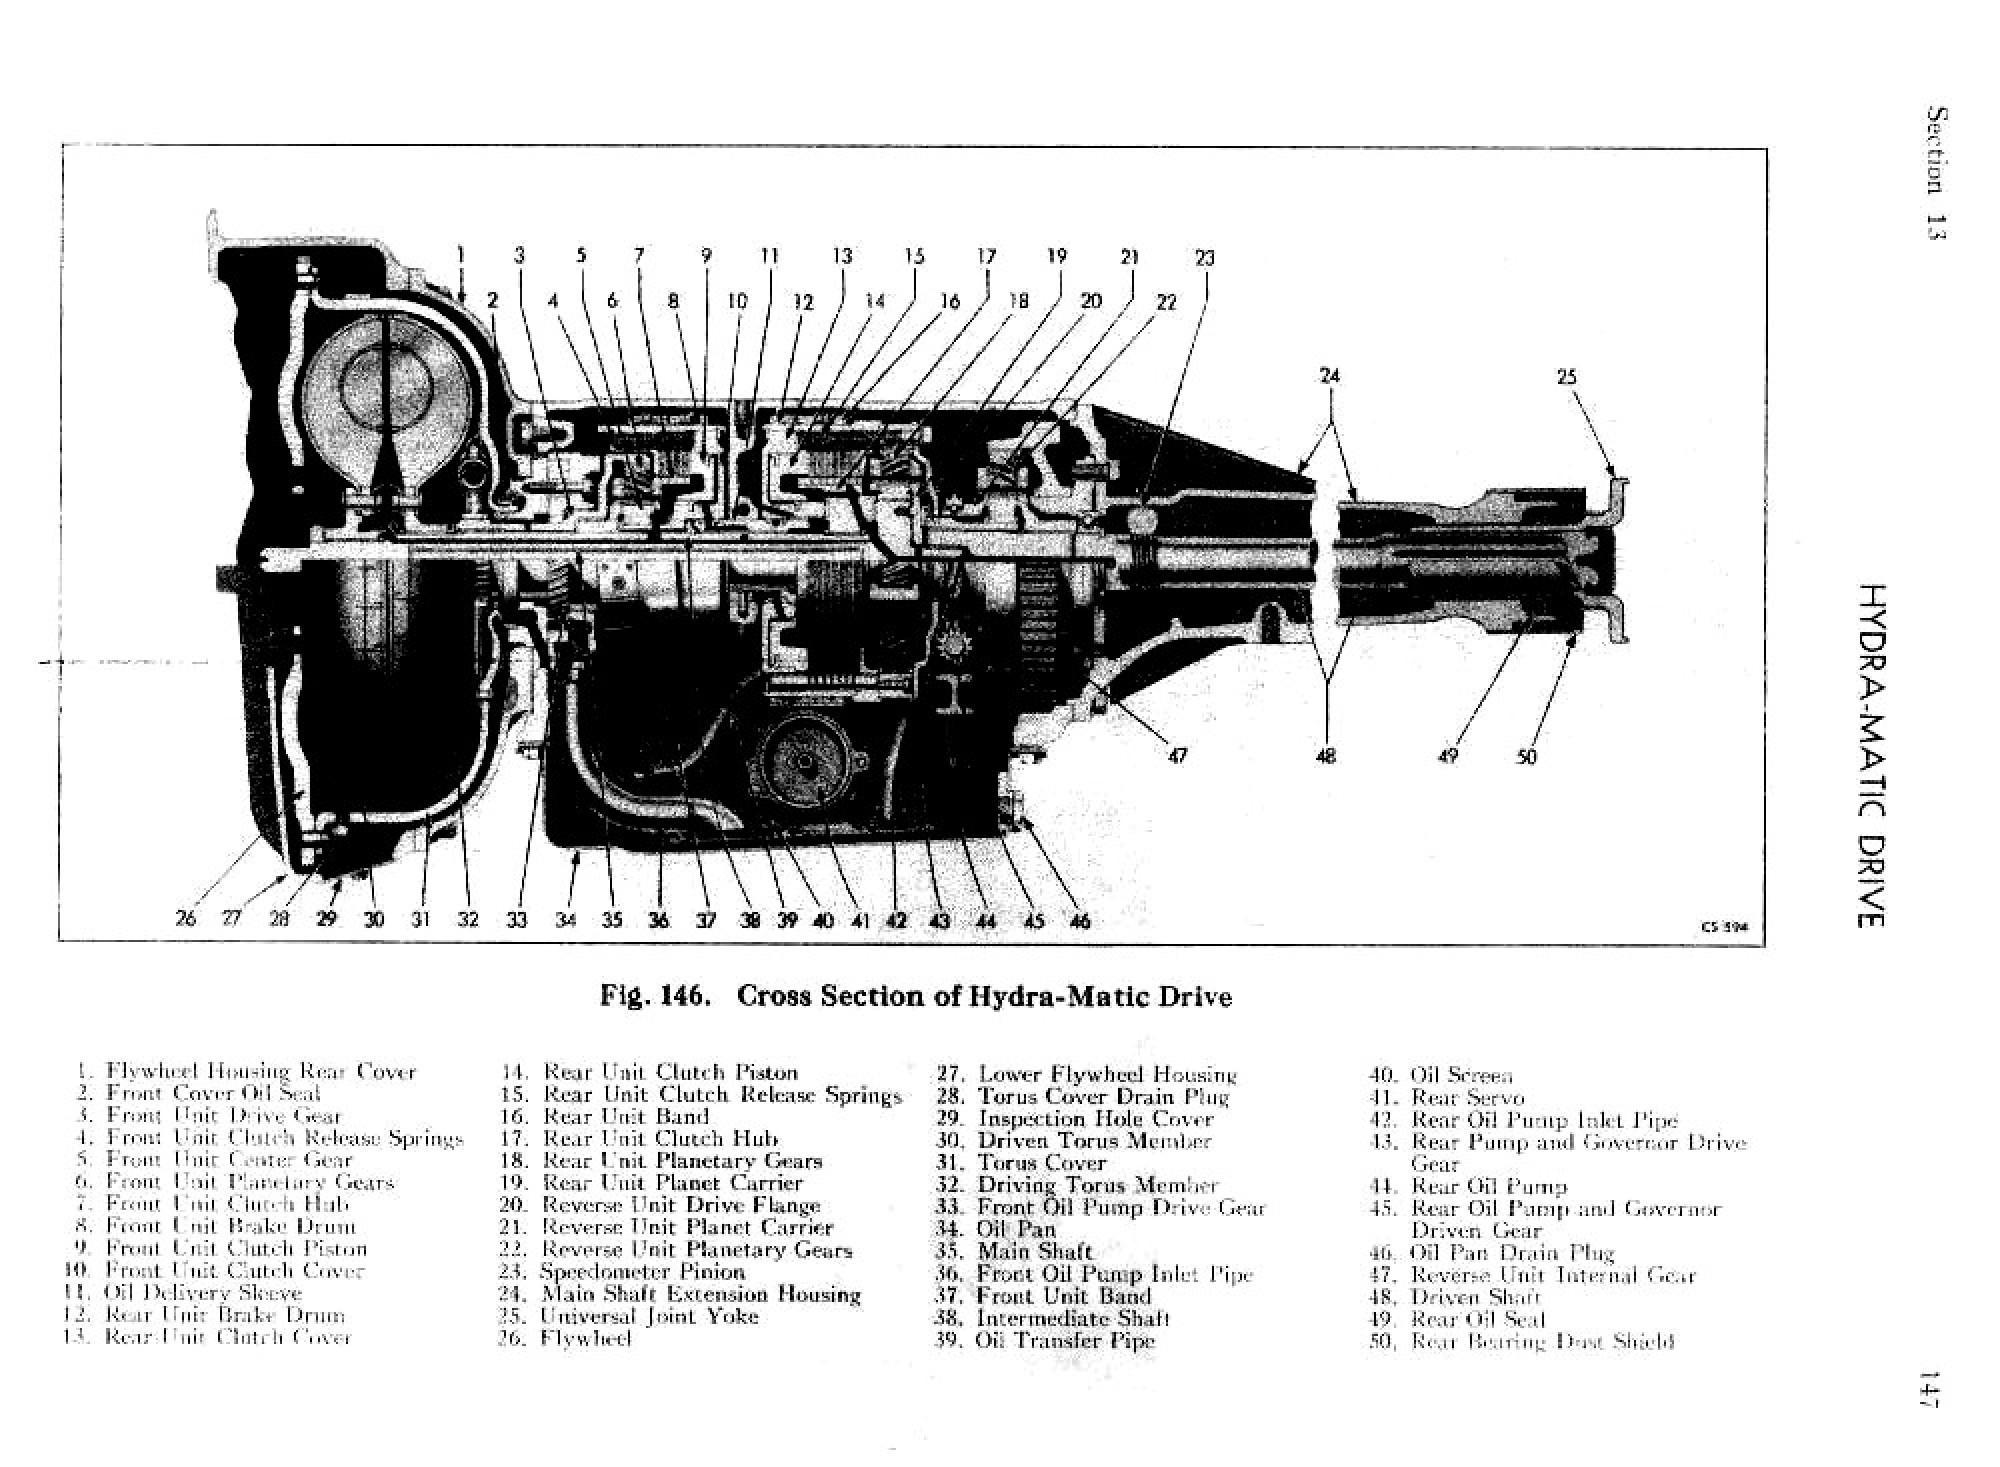 1949 Cadillac Shop Manual- Hydra-Matic Page 2 of 39